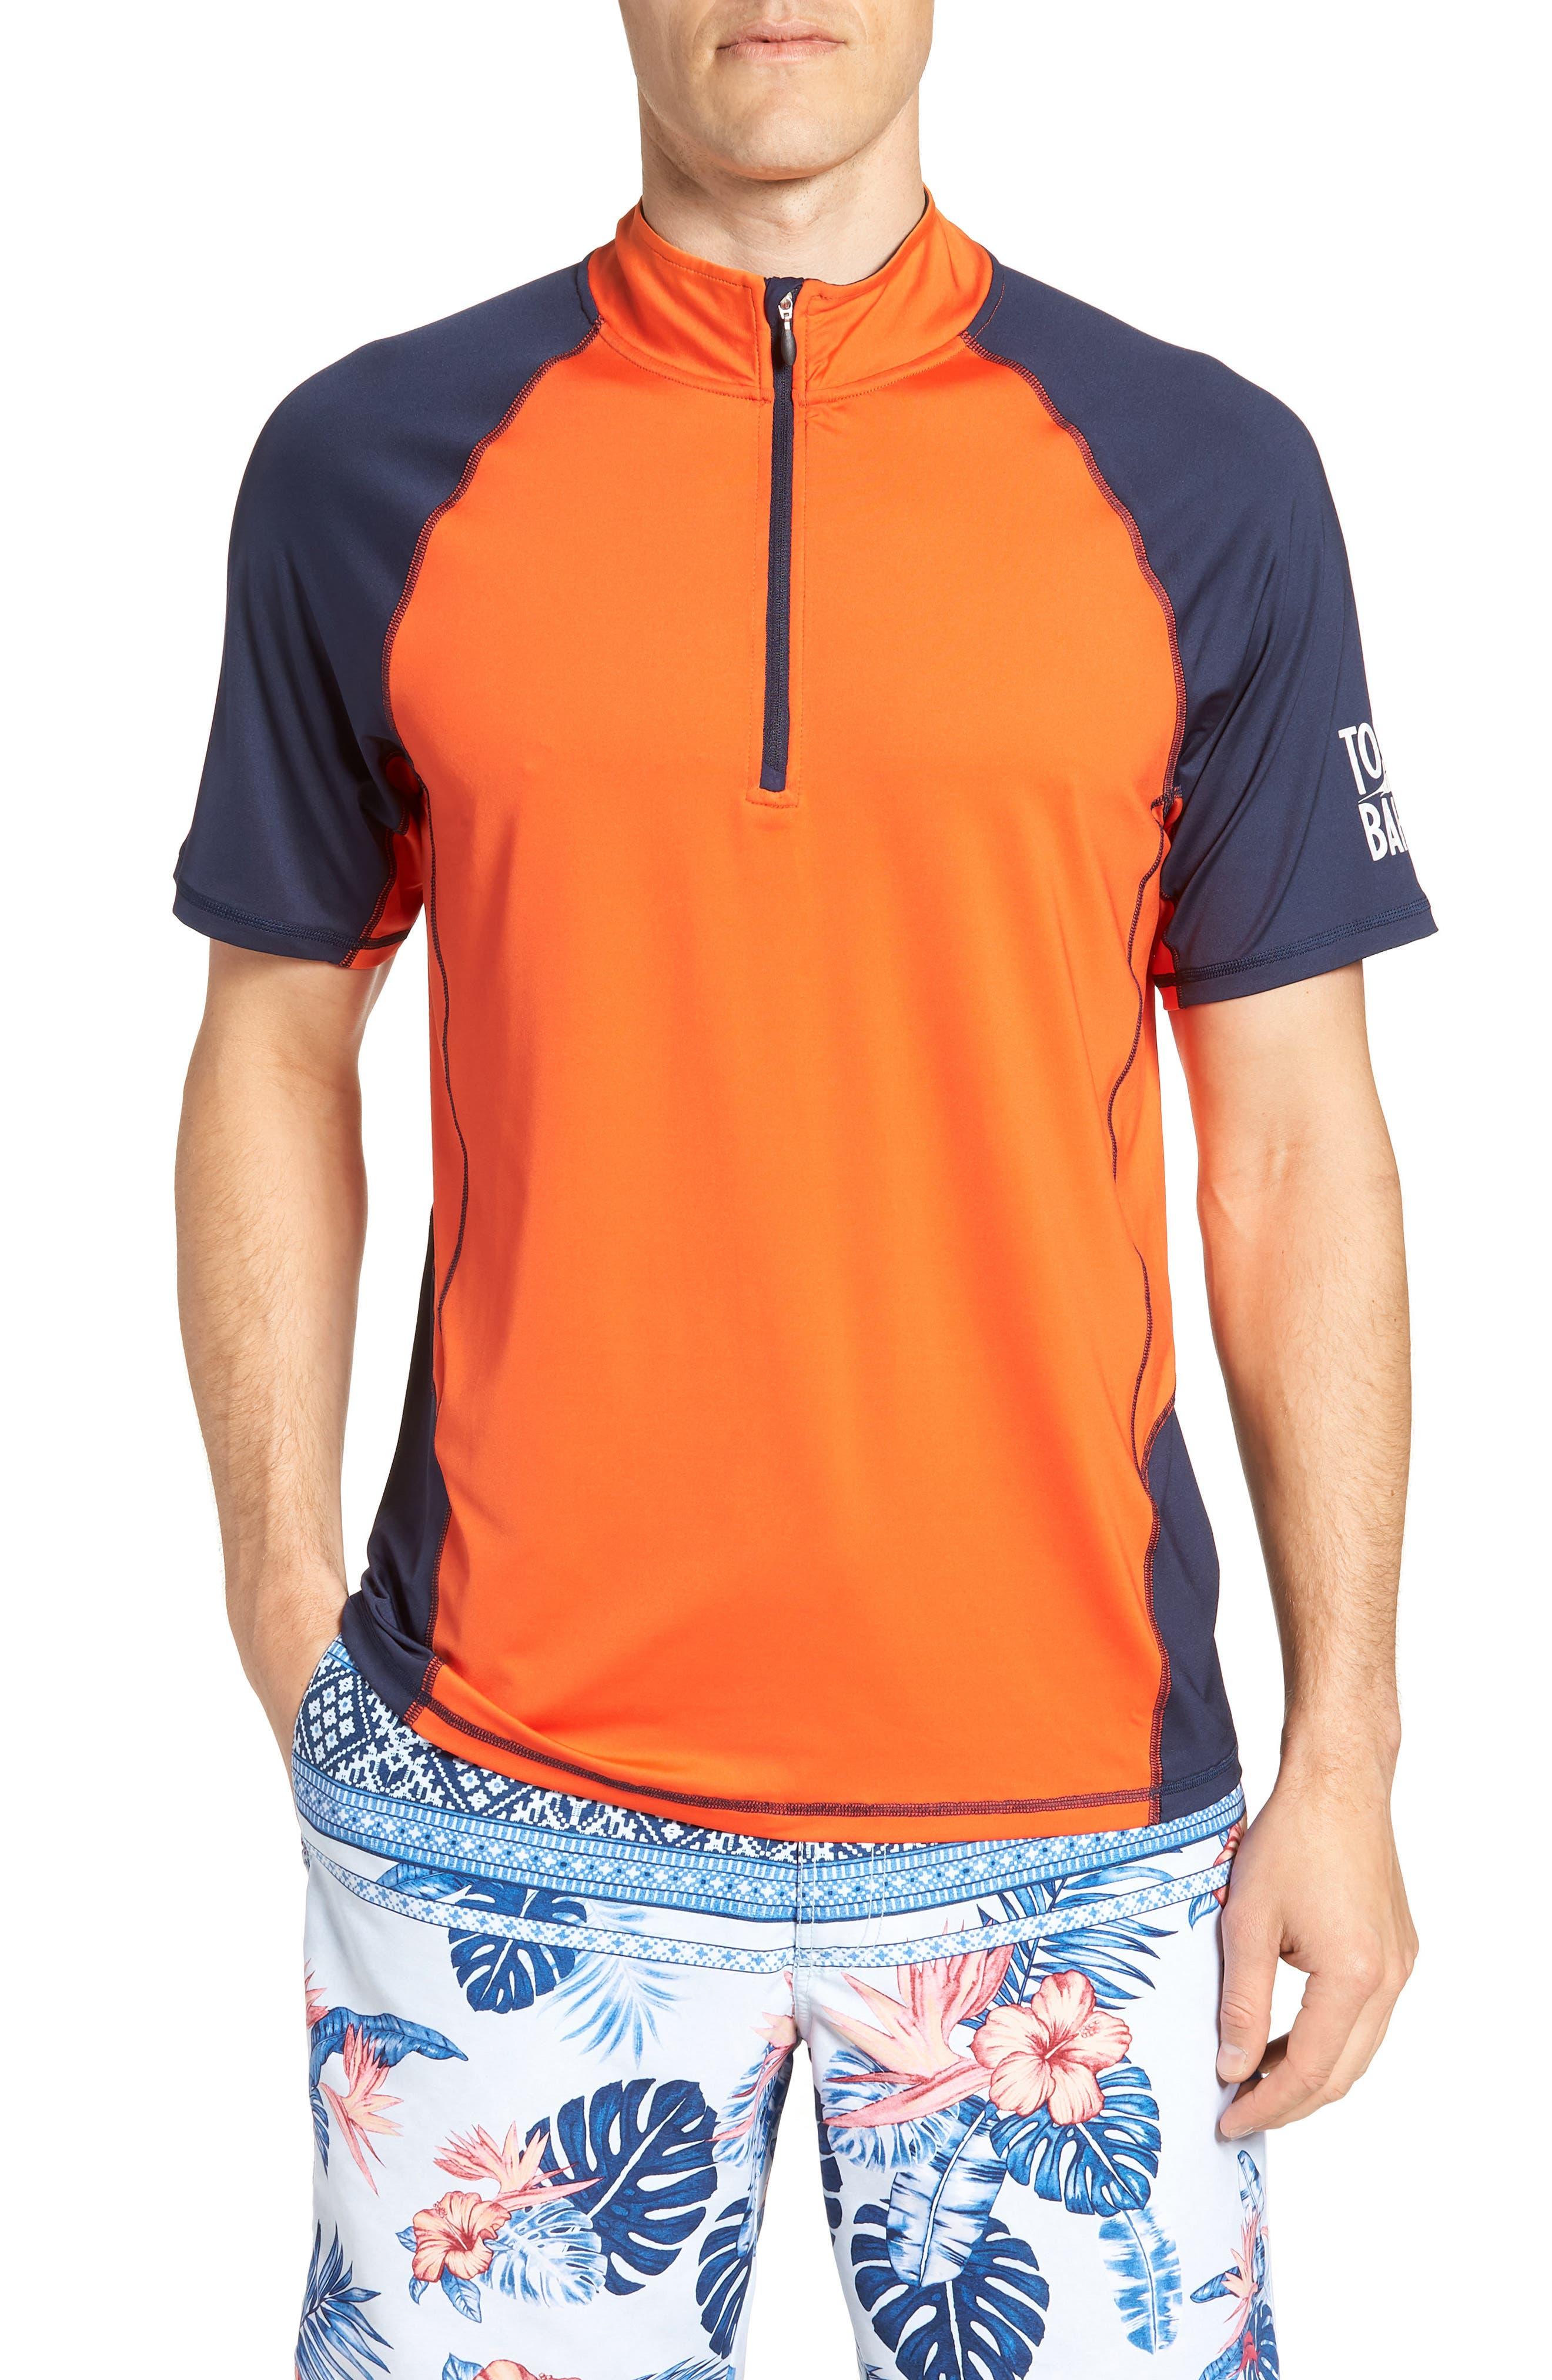 IslandActive<sup>™</sup> Colorblock Beach Pro Rashguard T-Shirt,                         Main,                         color, Fire Orange